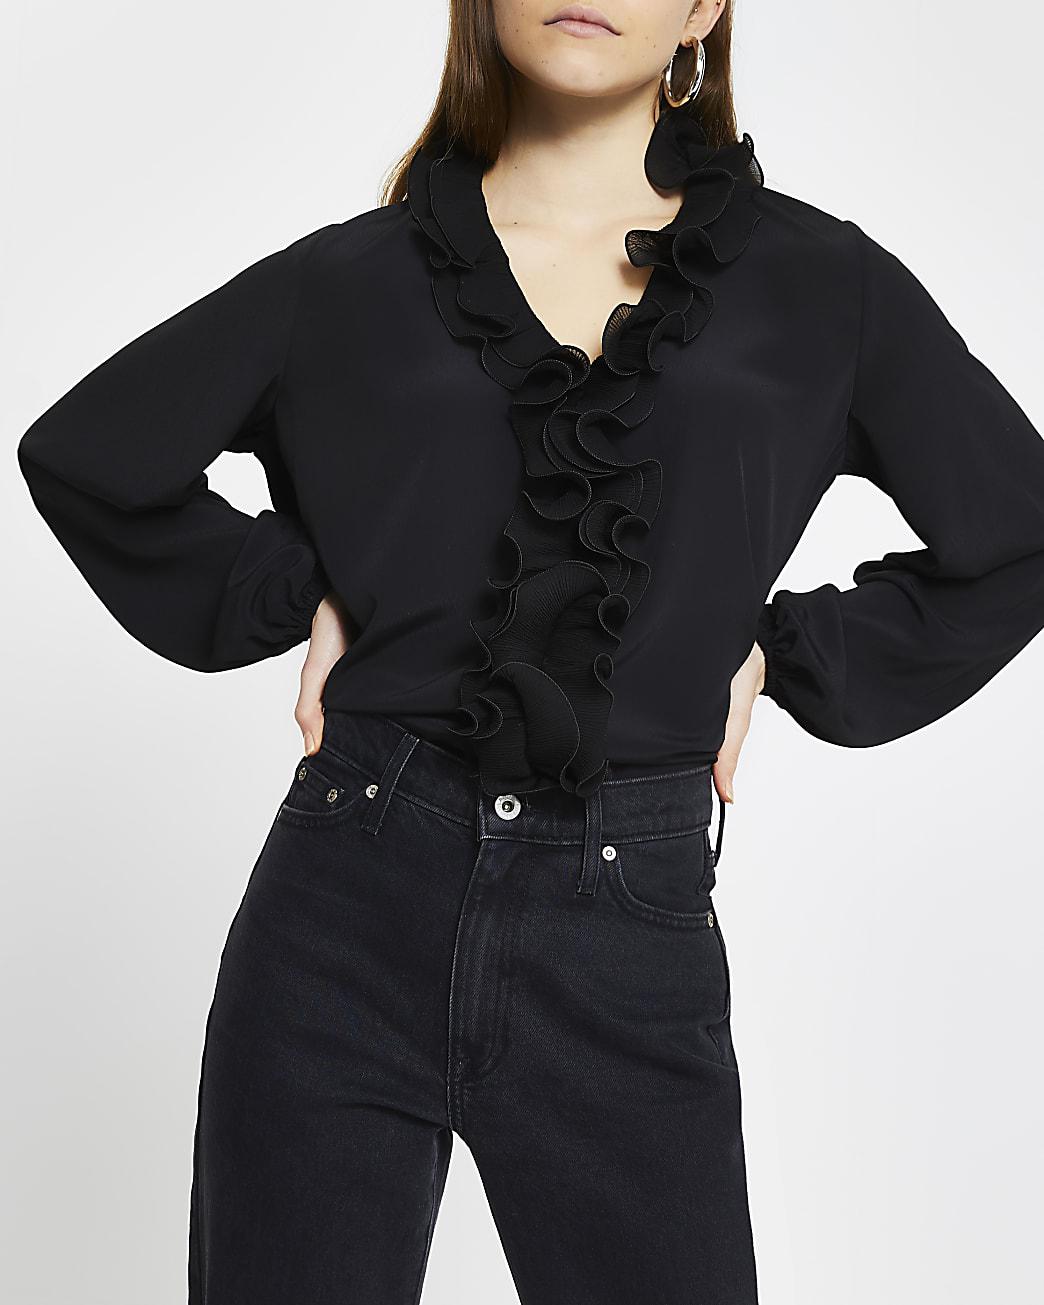 Black ruffle plisse long sleeve blouse top